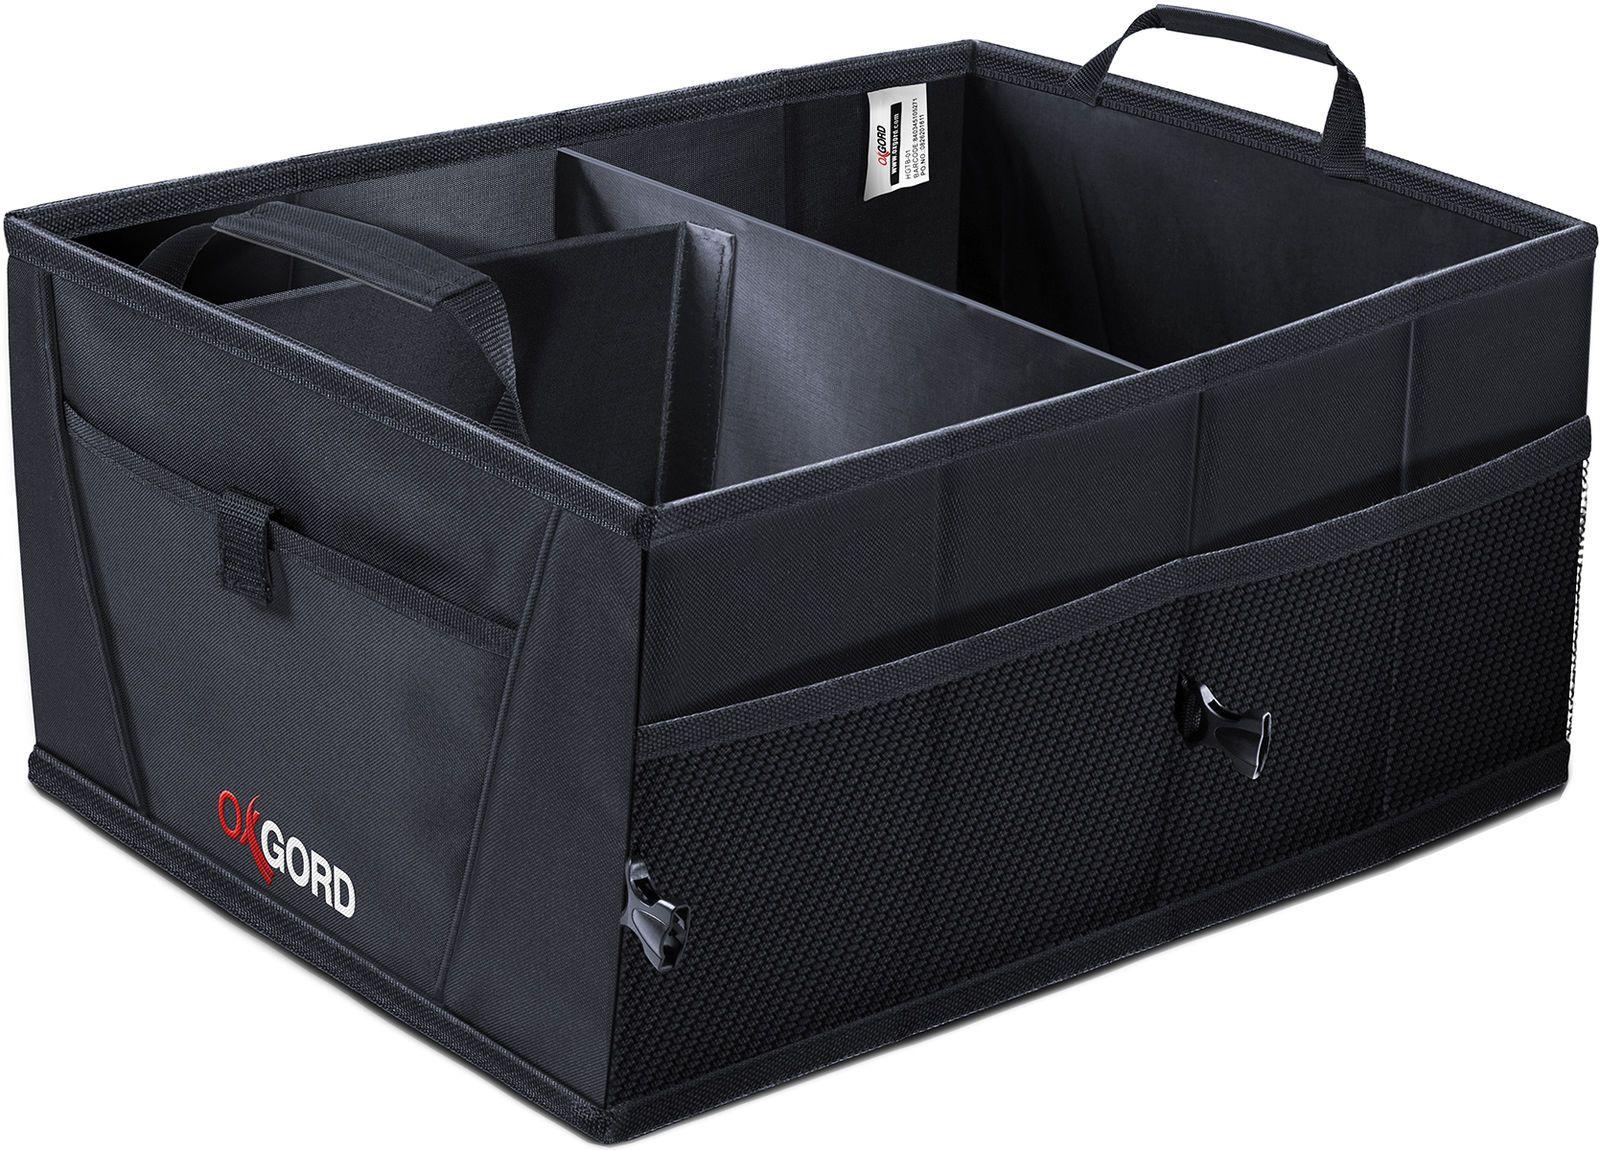 Awesome Amazing Trunk Cargo Organizer Folding Caddy Storage Collapse Bag  Bin For Car Truck SUV 2017